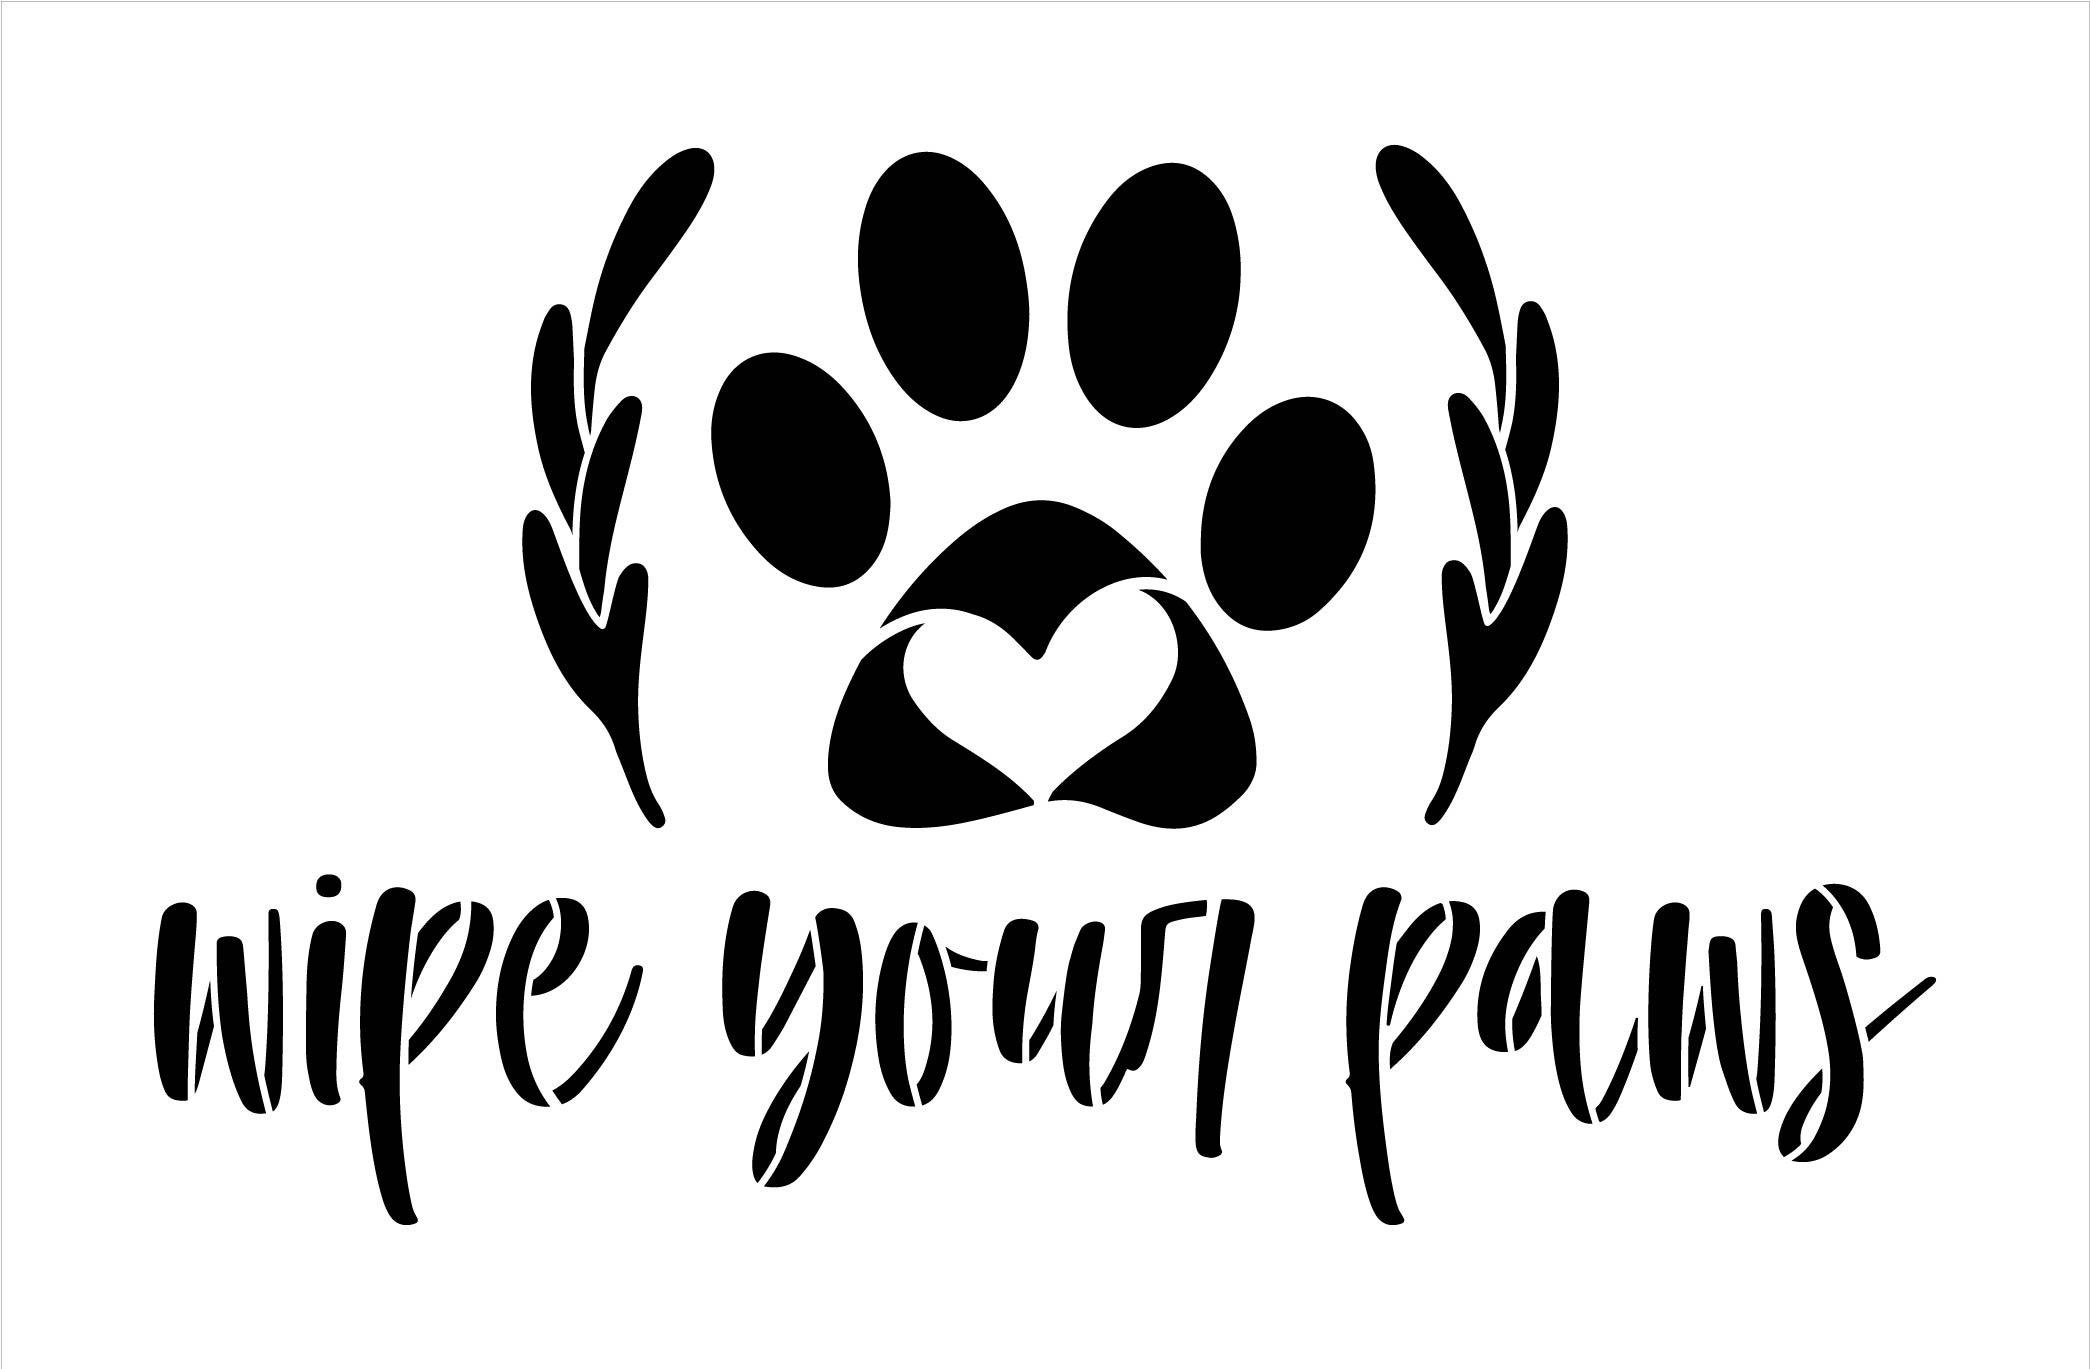 Wipe Your Paws Stencil with Laurels by StudioR12 | Paint DIY Farmhouse Doormat | Pet Lover Cursive Script Word Art | Select Size